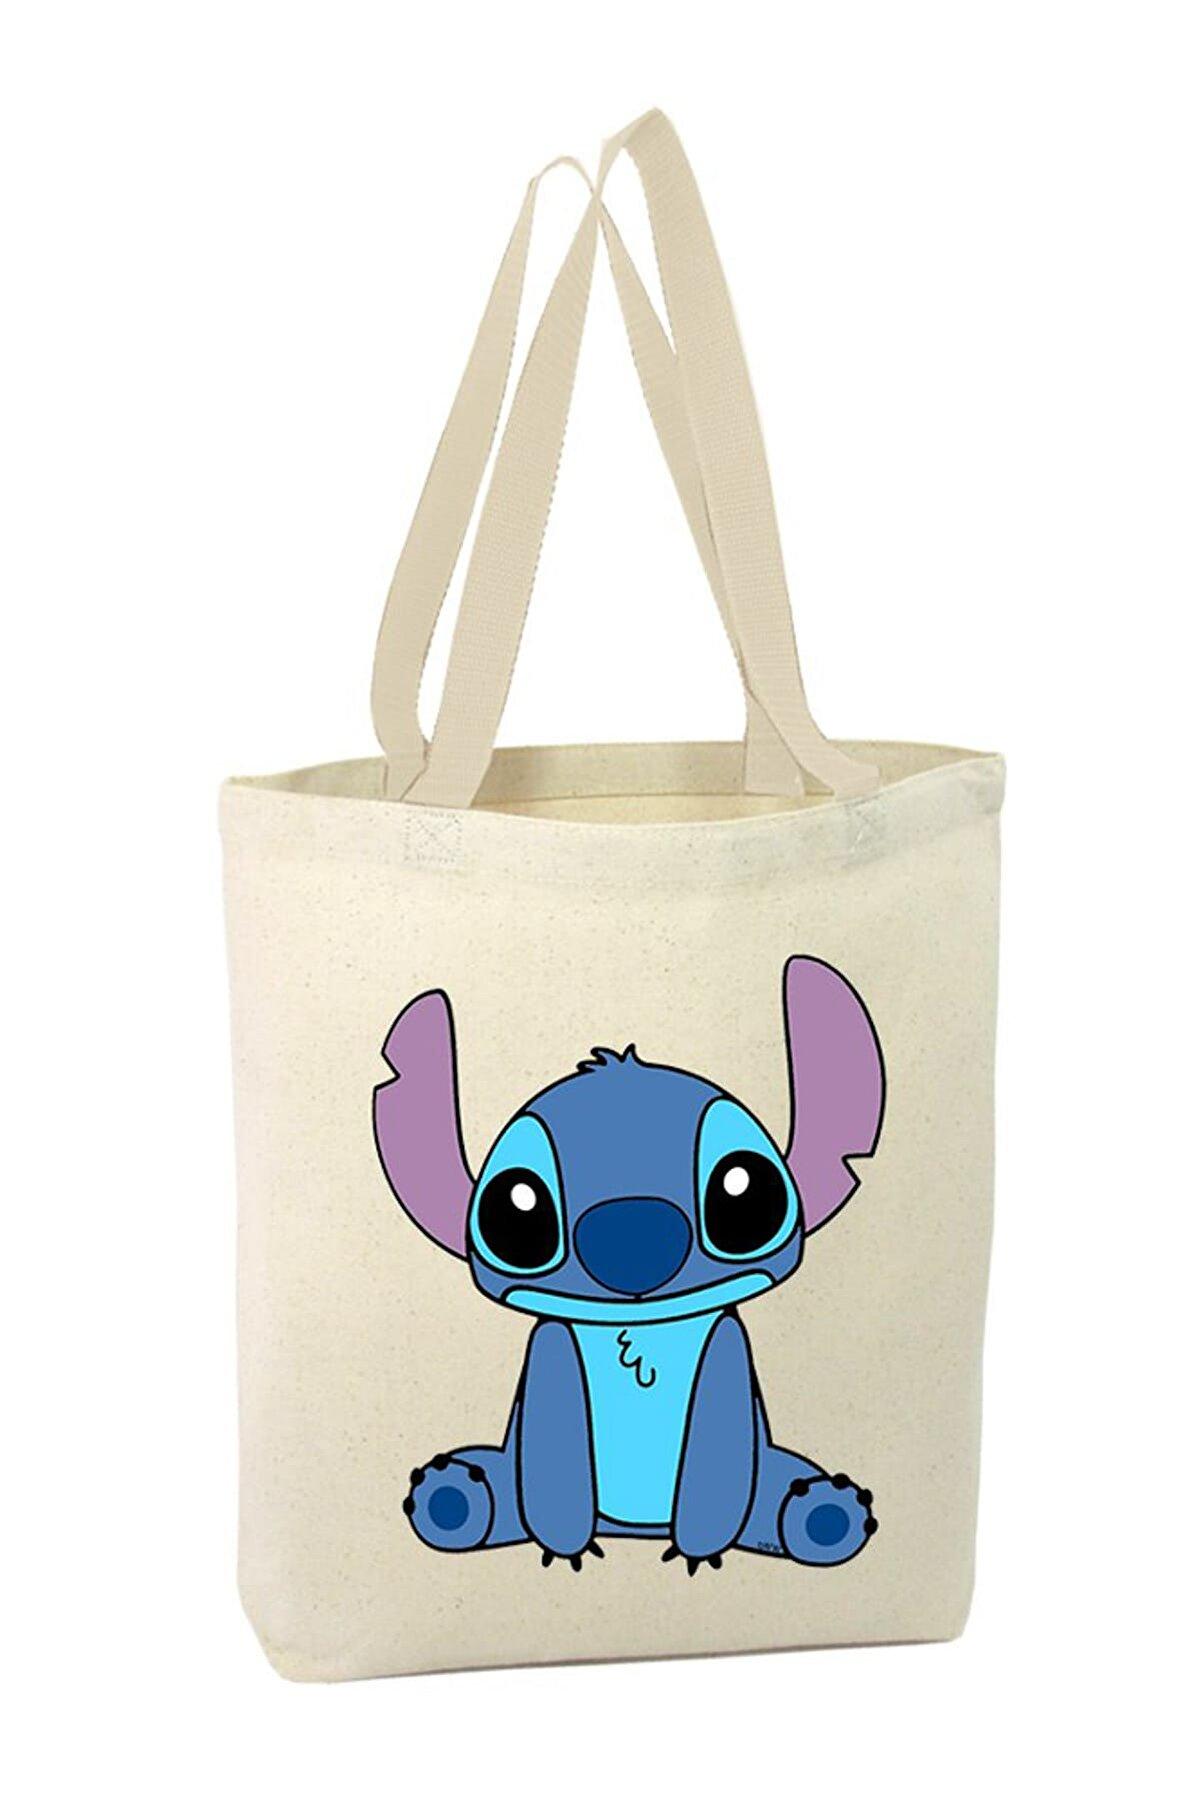 Angemiel Lilo ve Stitch Stitch Baskılı Alışveriş Plaj Bez Çanta 3008152